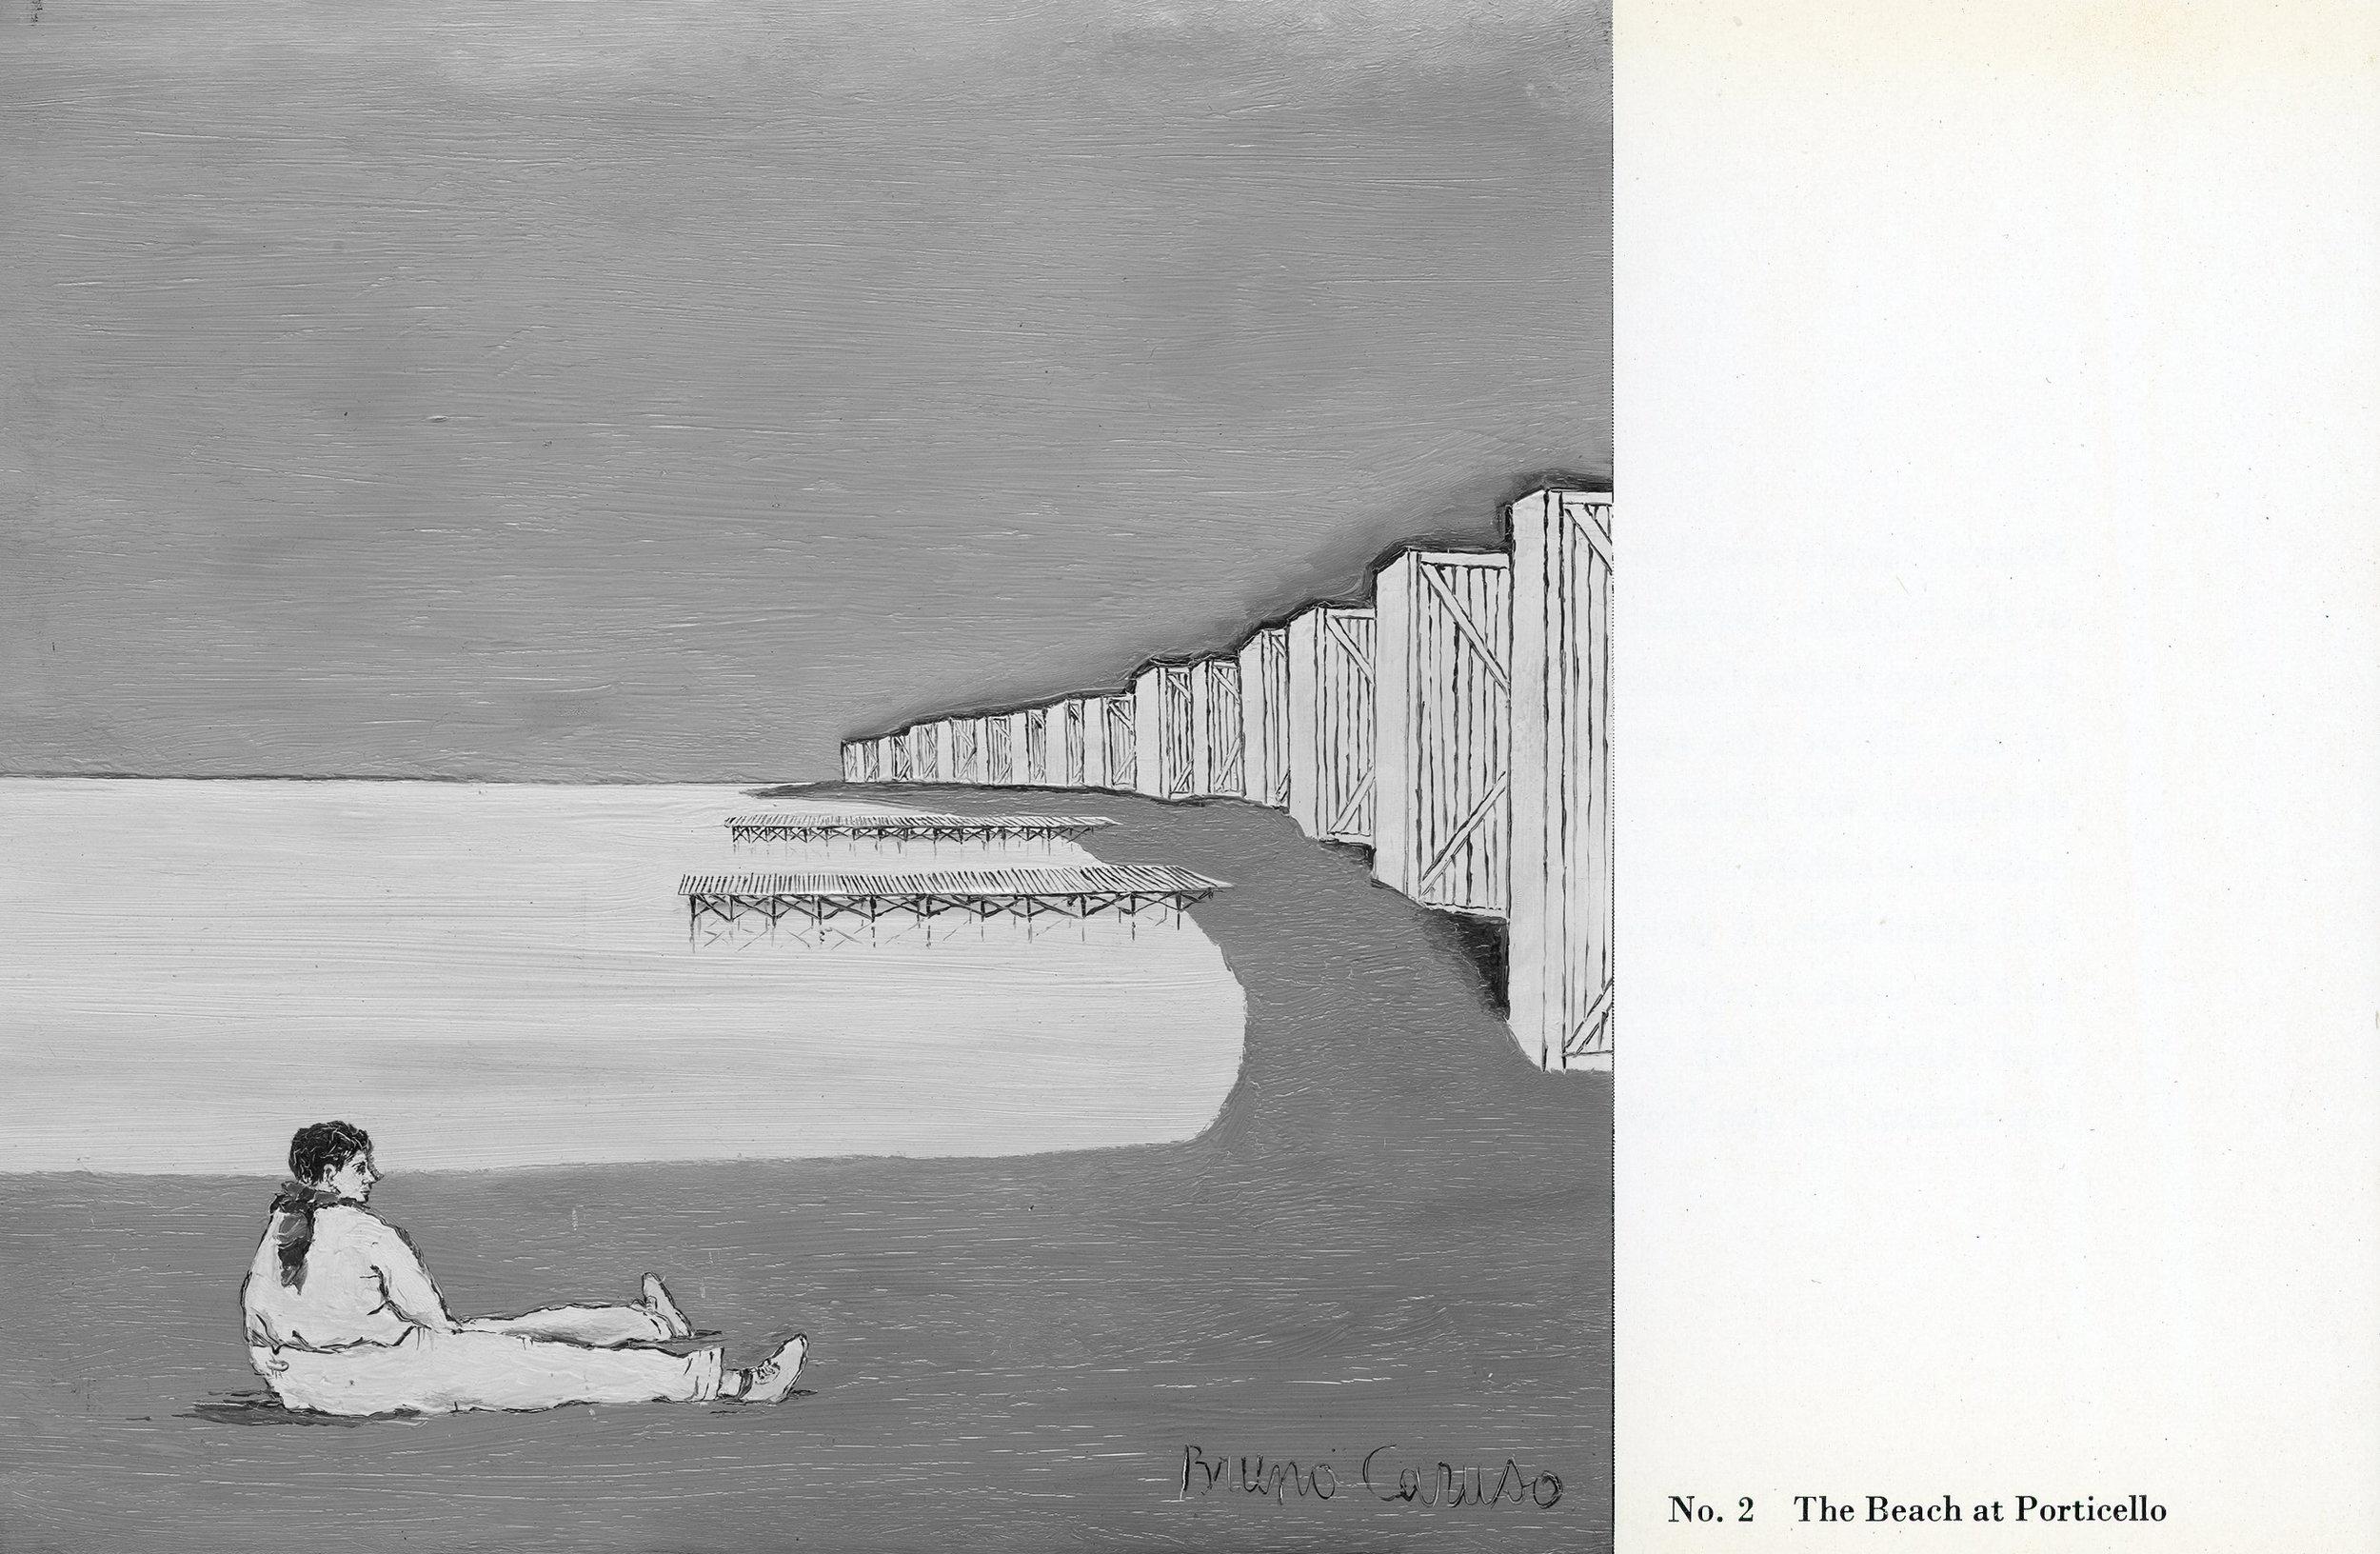 1955-10 Arthur Jeffress - Bruno Caruso_04.jpg